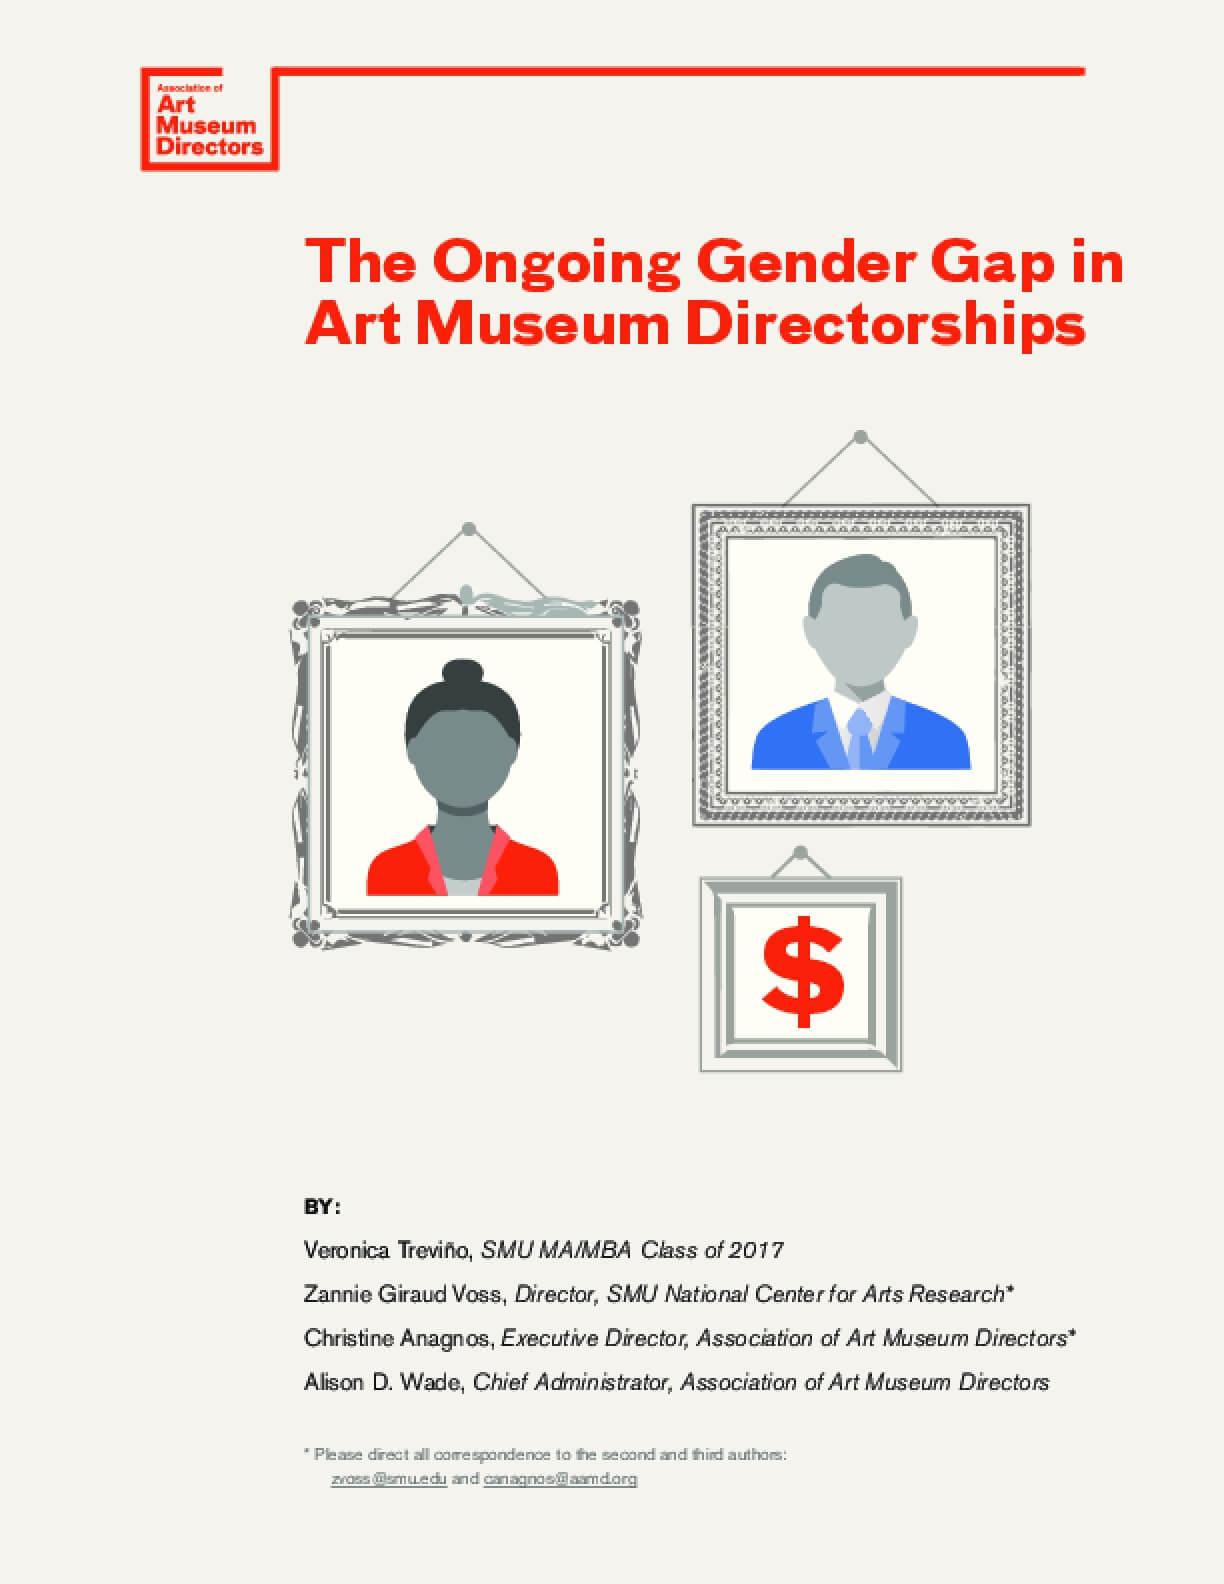 The Ongoing Gender Gap in Art Museum Directorships